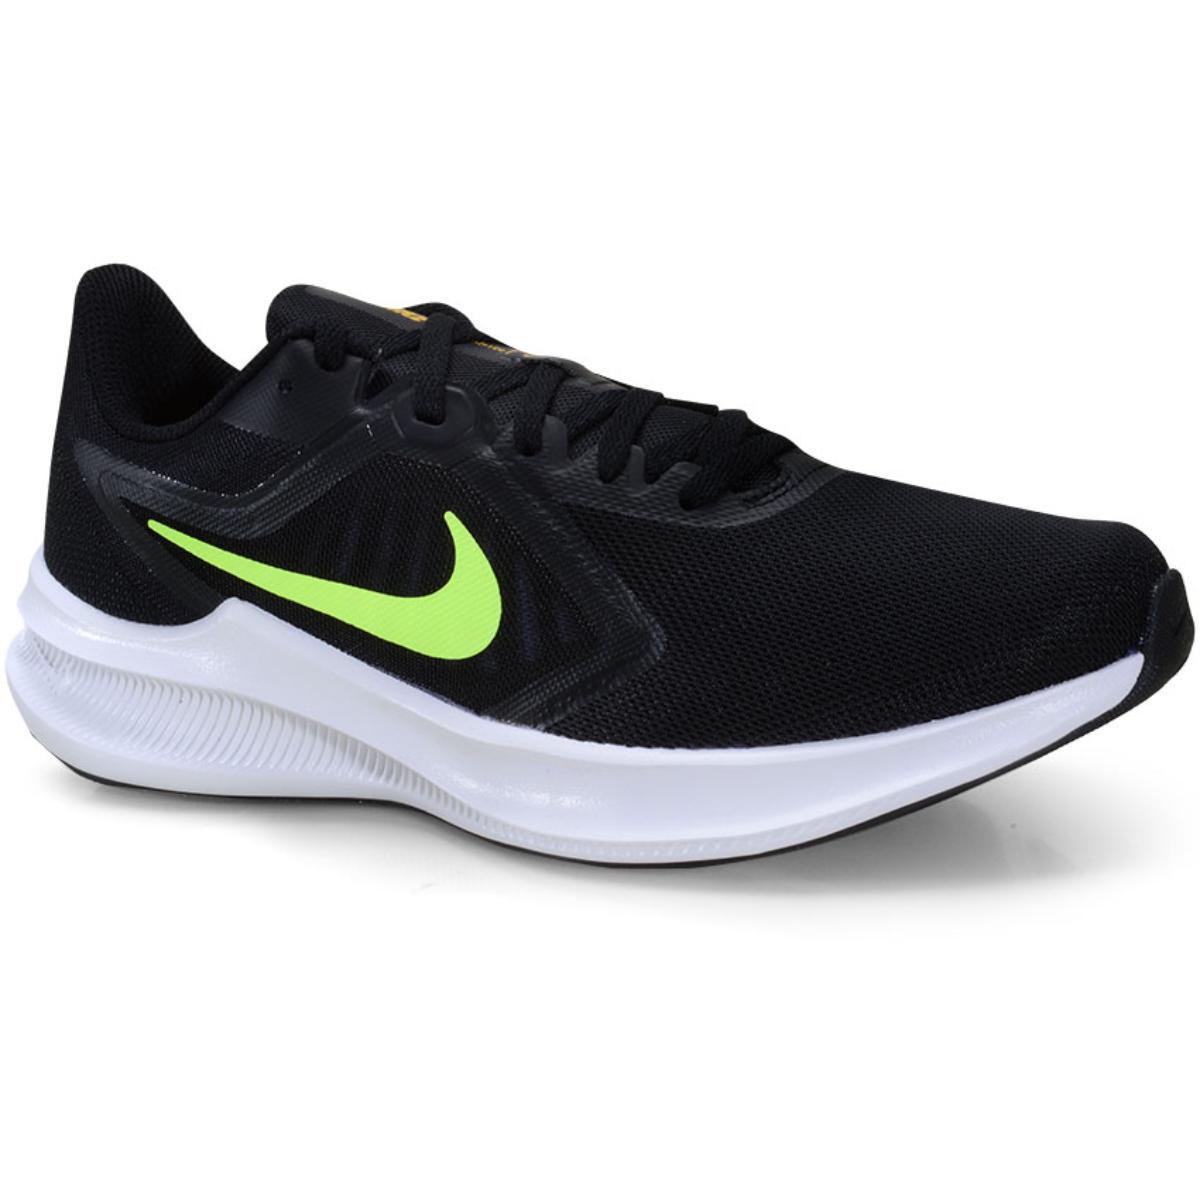 Tênis Masculino Nike Ci9981-009 Downshifter 10 Preto/limão